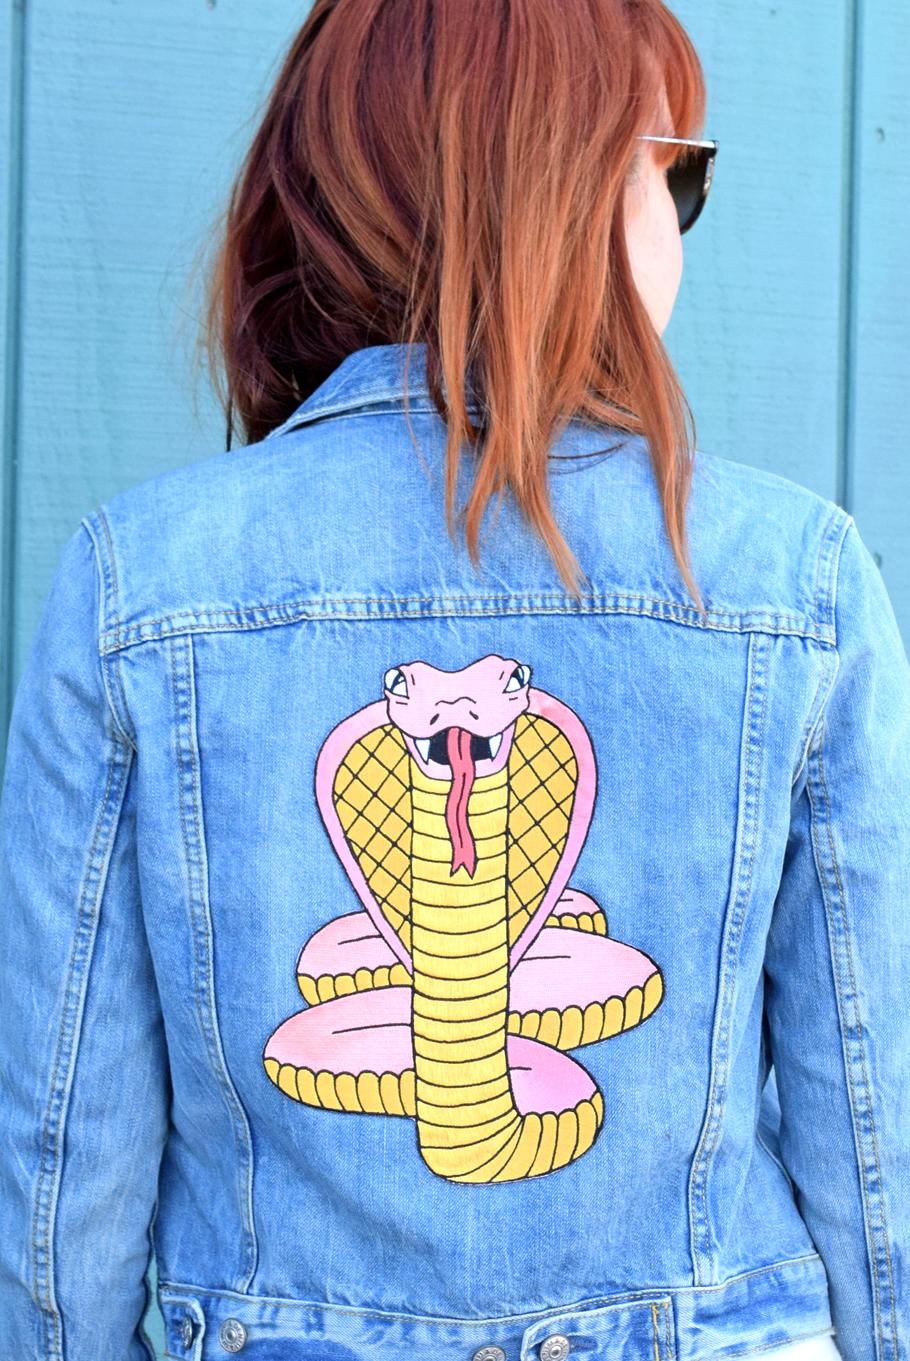 Cobra Back Patch Valley Cruise Press Diy Denim Jacket Denim Design Painted Denim Jacket [ 1361 x 910 Pixel ]